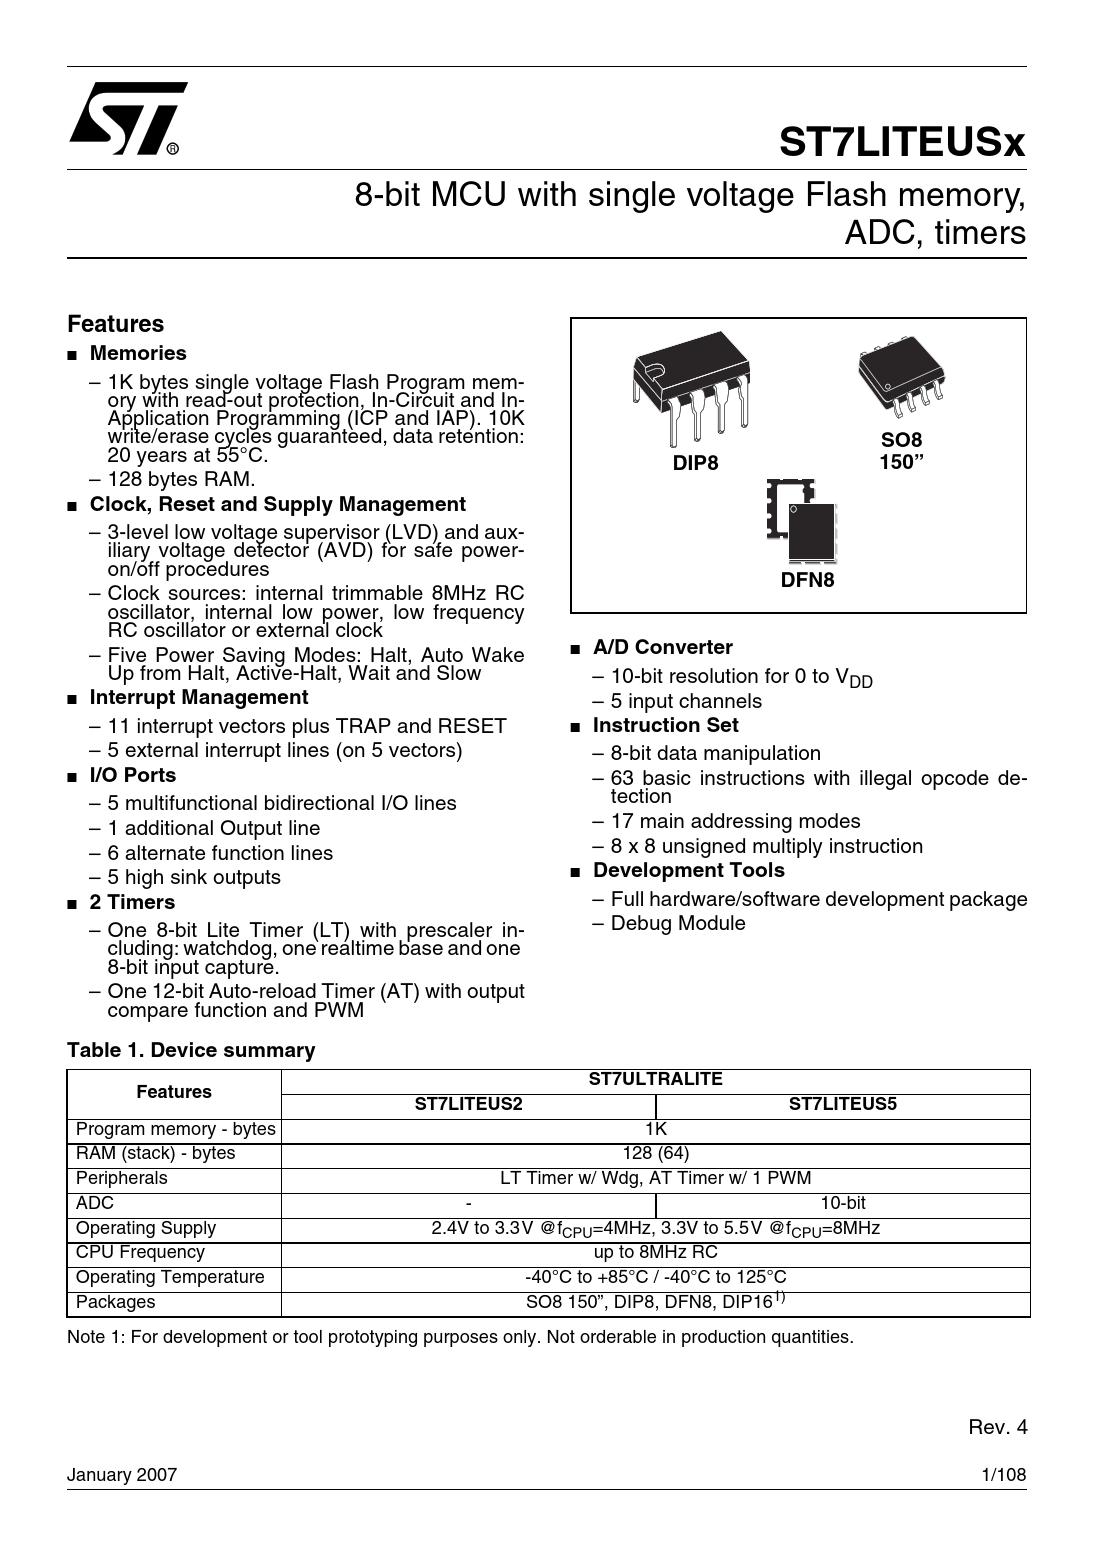 Datasheet ST7LITEUSx STMicroelectronics